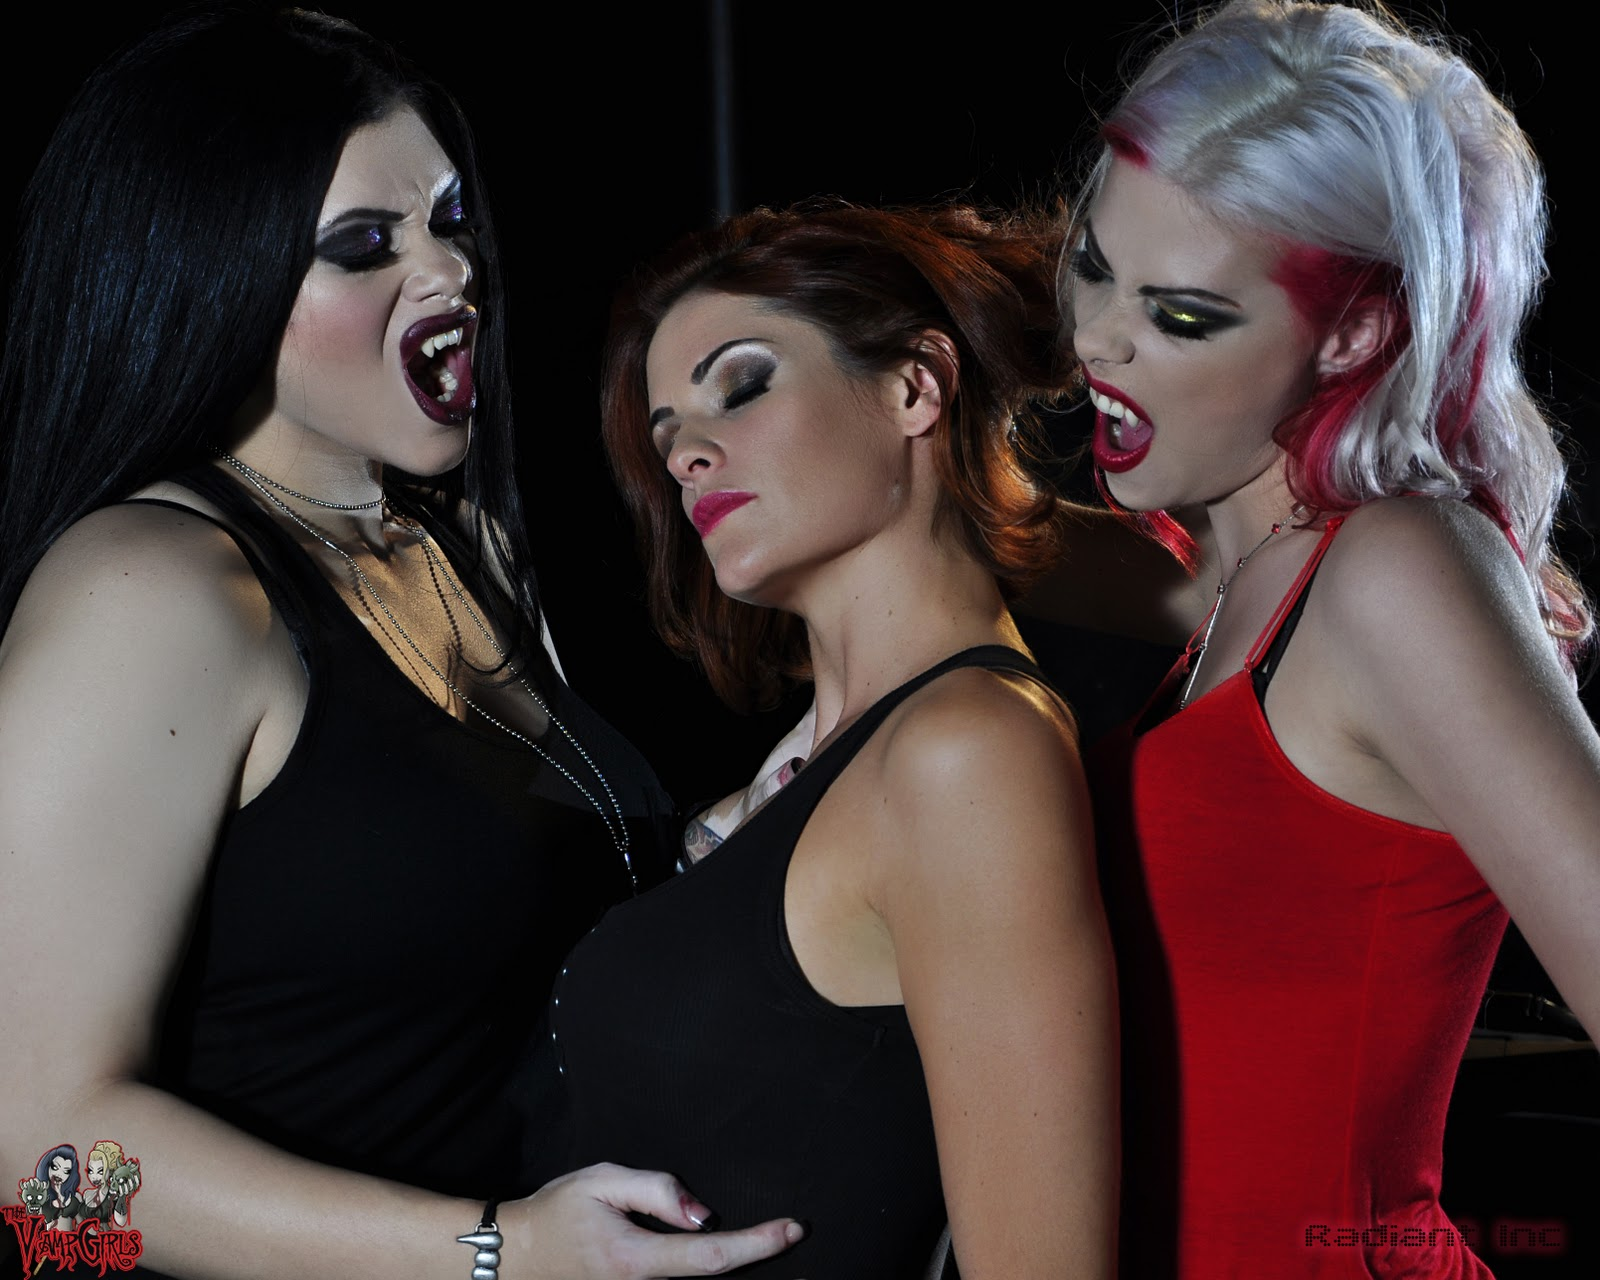 Hot female vampires photos xxx clip